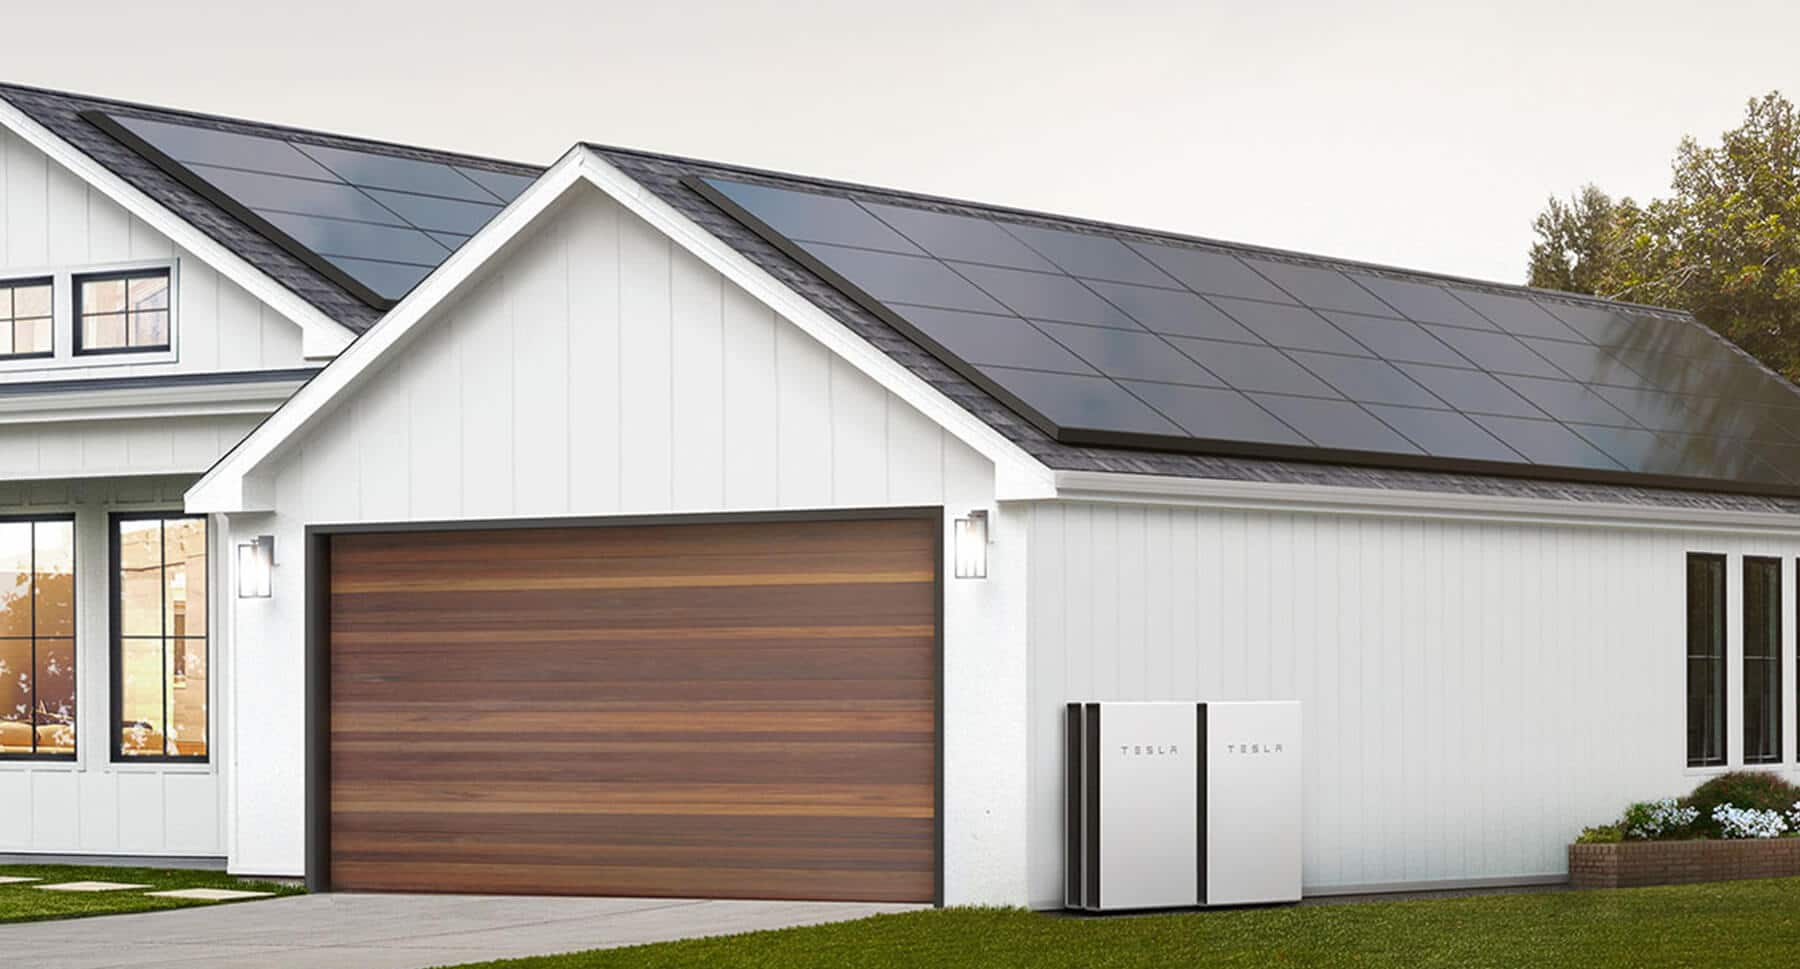 Tesla solar panel system with full skirting